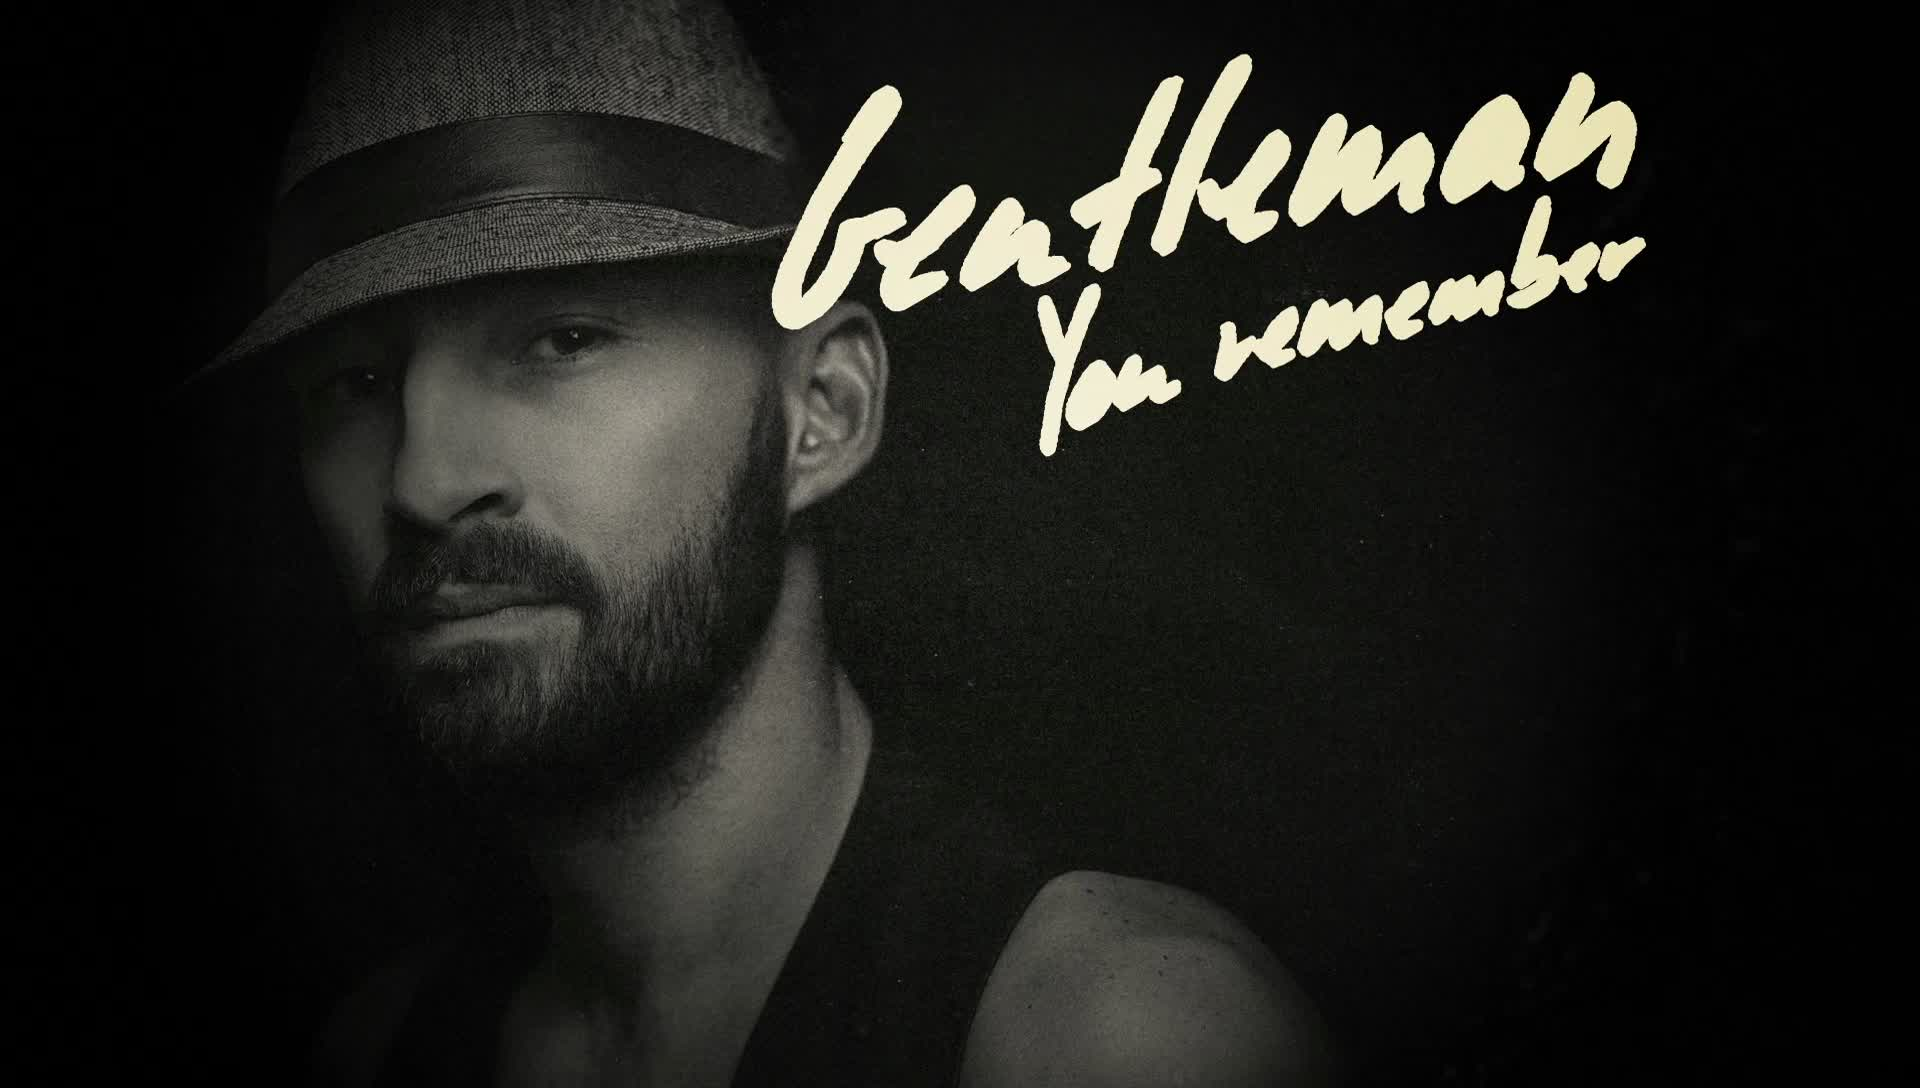 Gentleman, You Remember (Lyric Video)